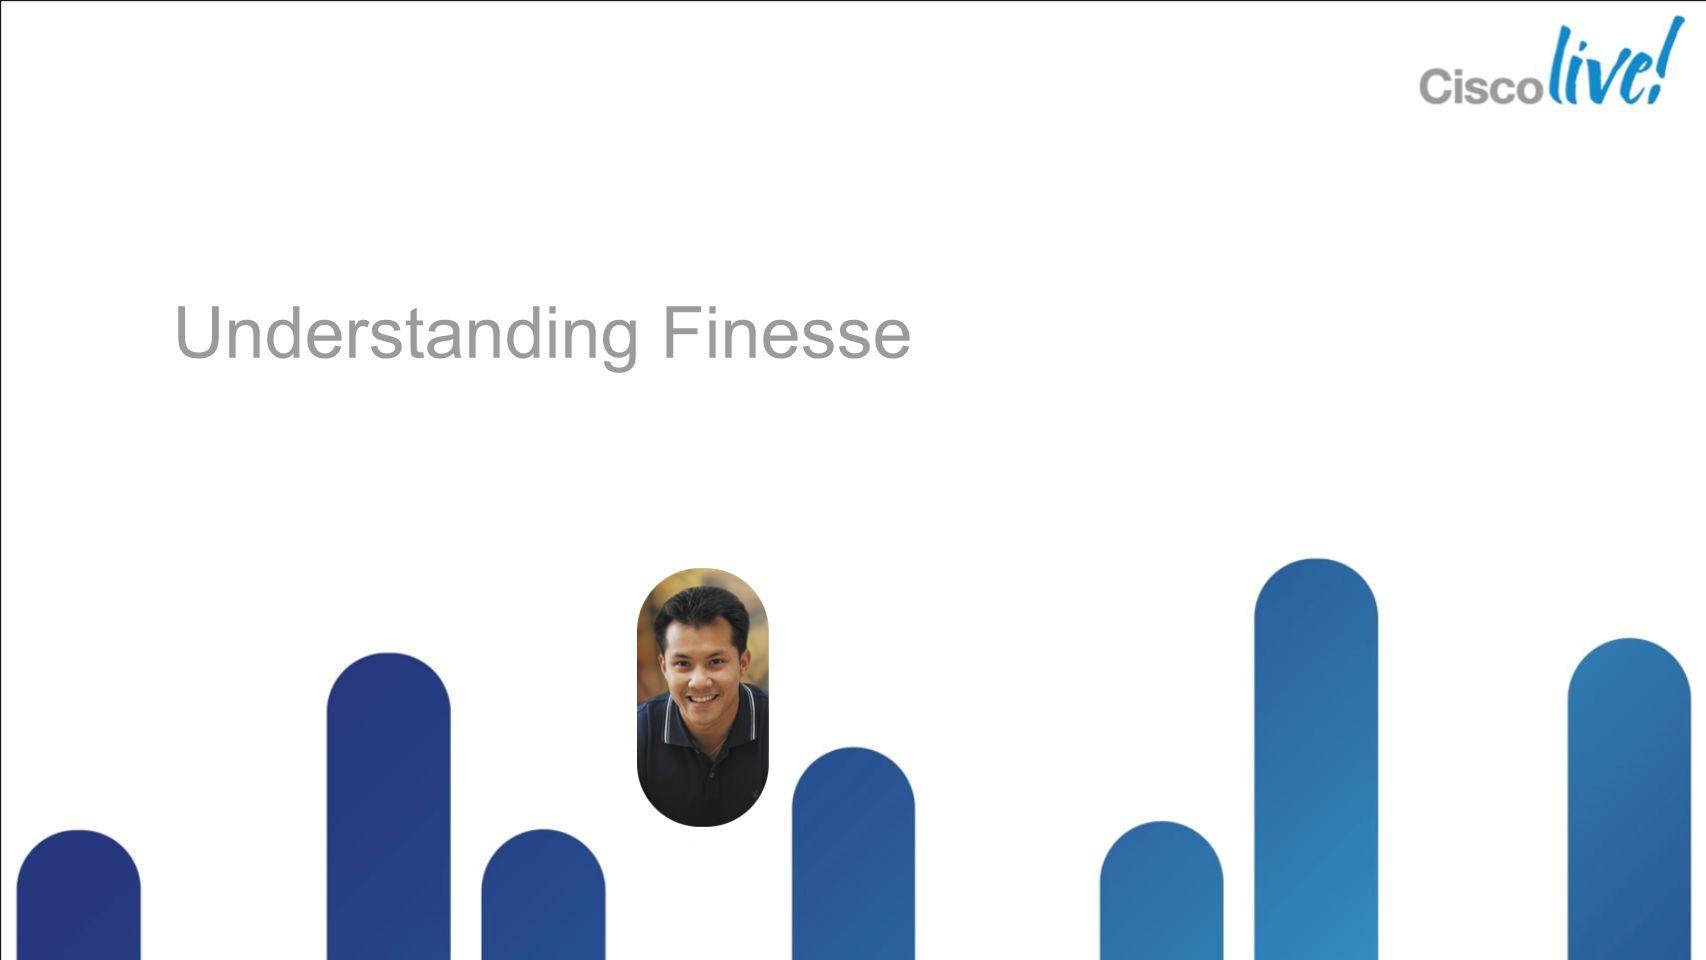 Understanding Finesse